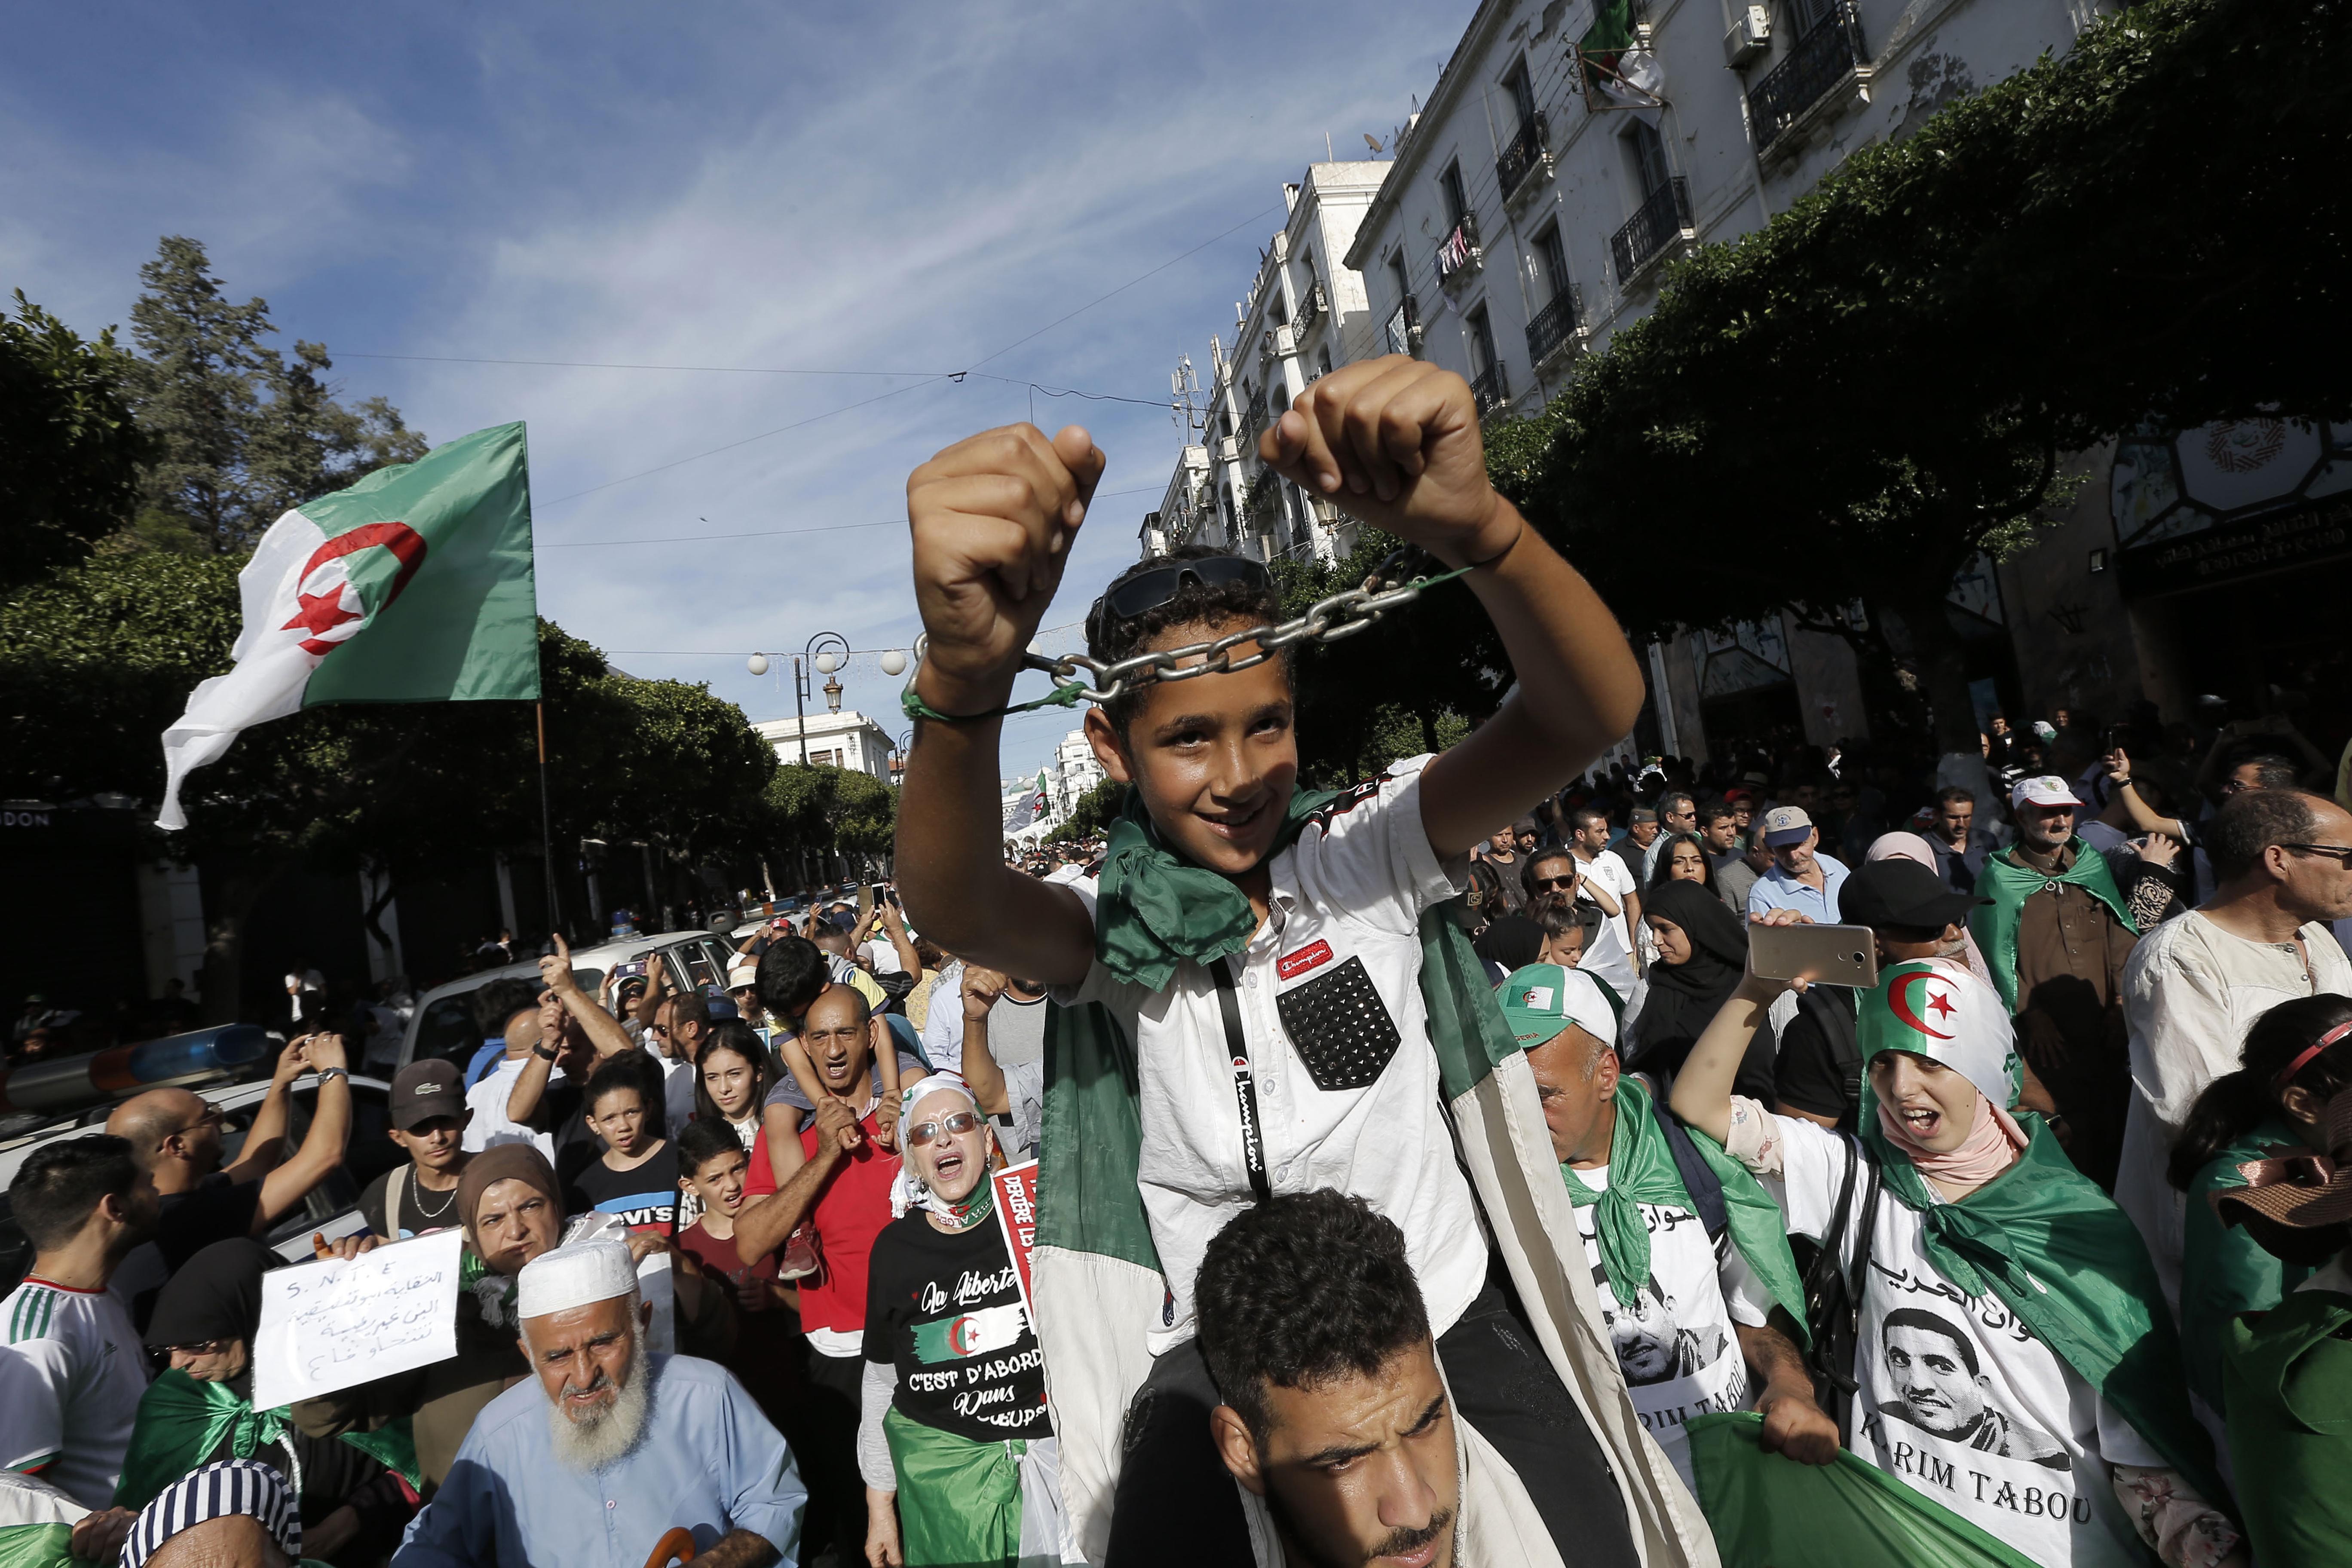 Des manifestants défilant dans les rues d'Alger, vendredi 18 octobre 2019 (image d'illustration).